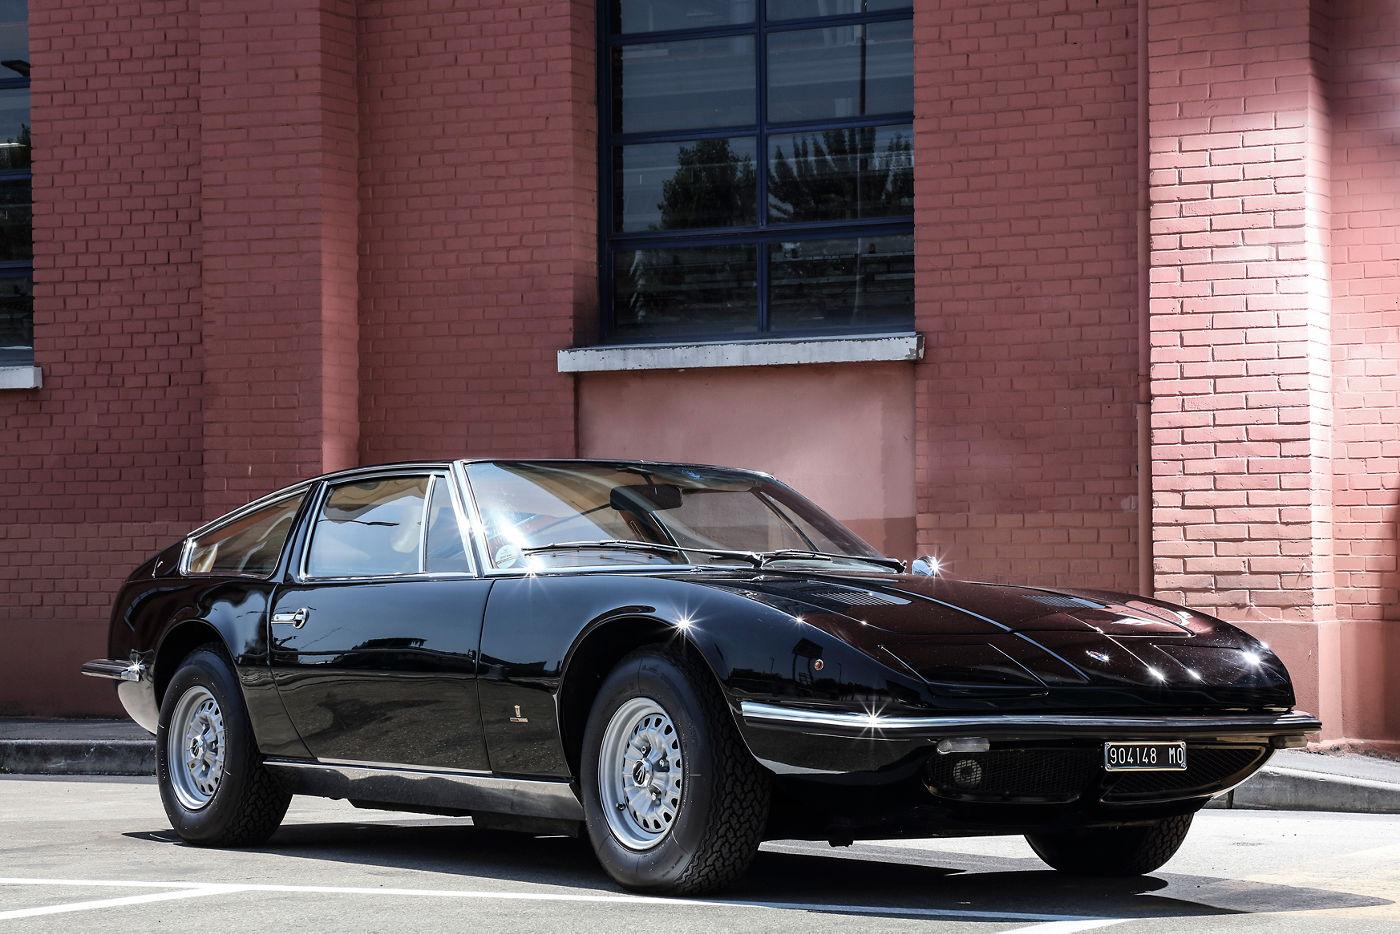 Maserati Indy America 4700